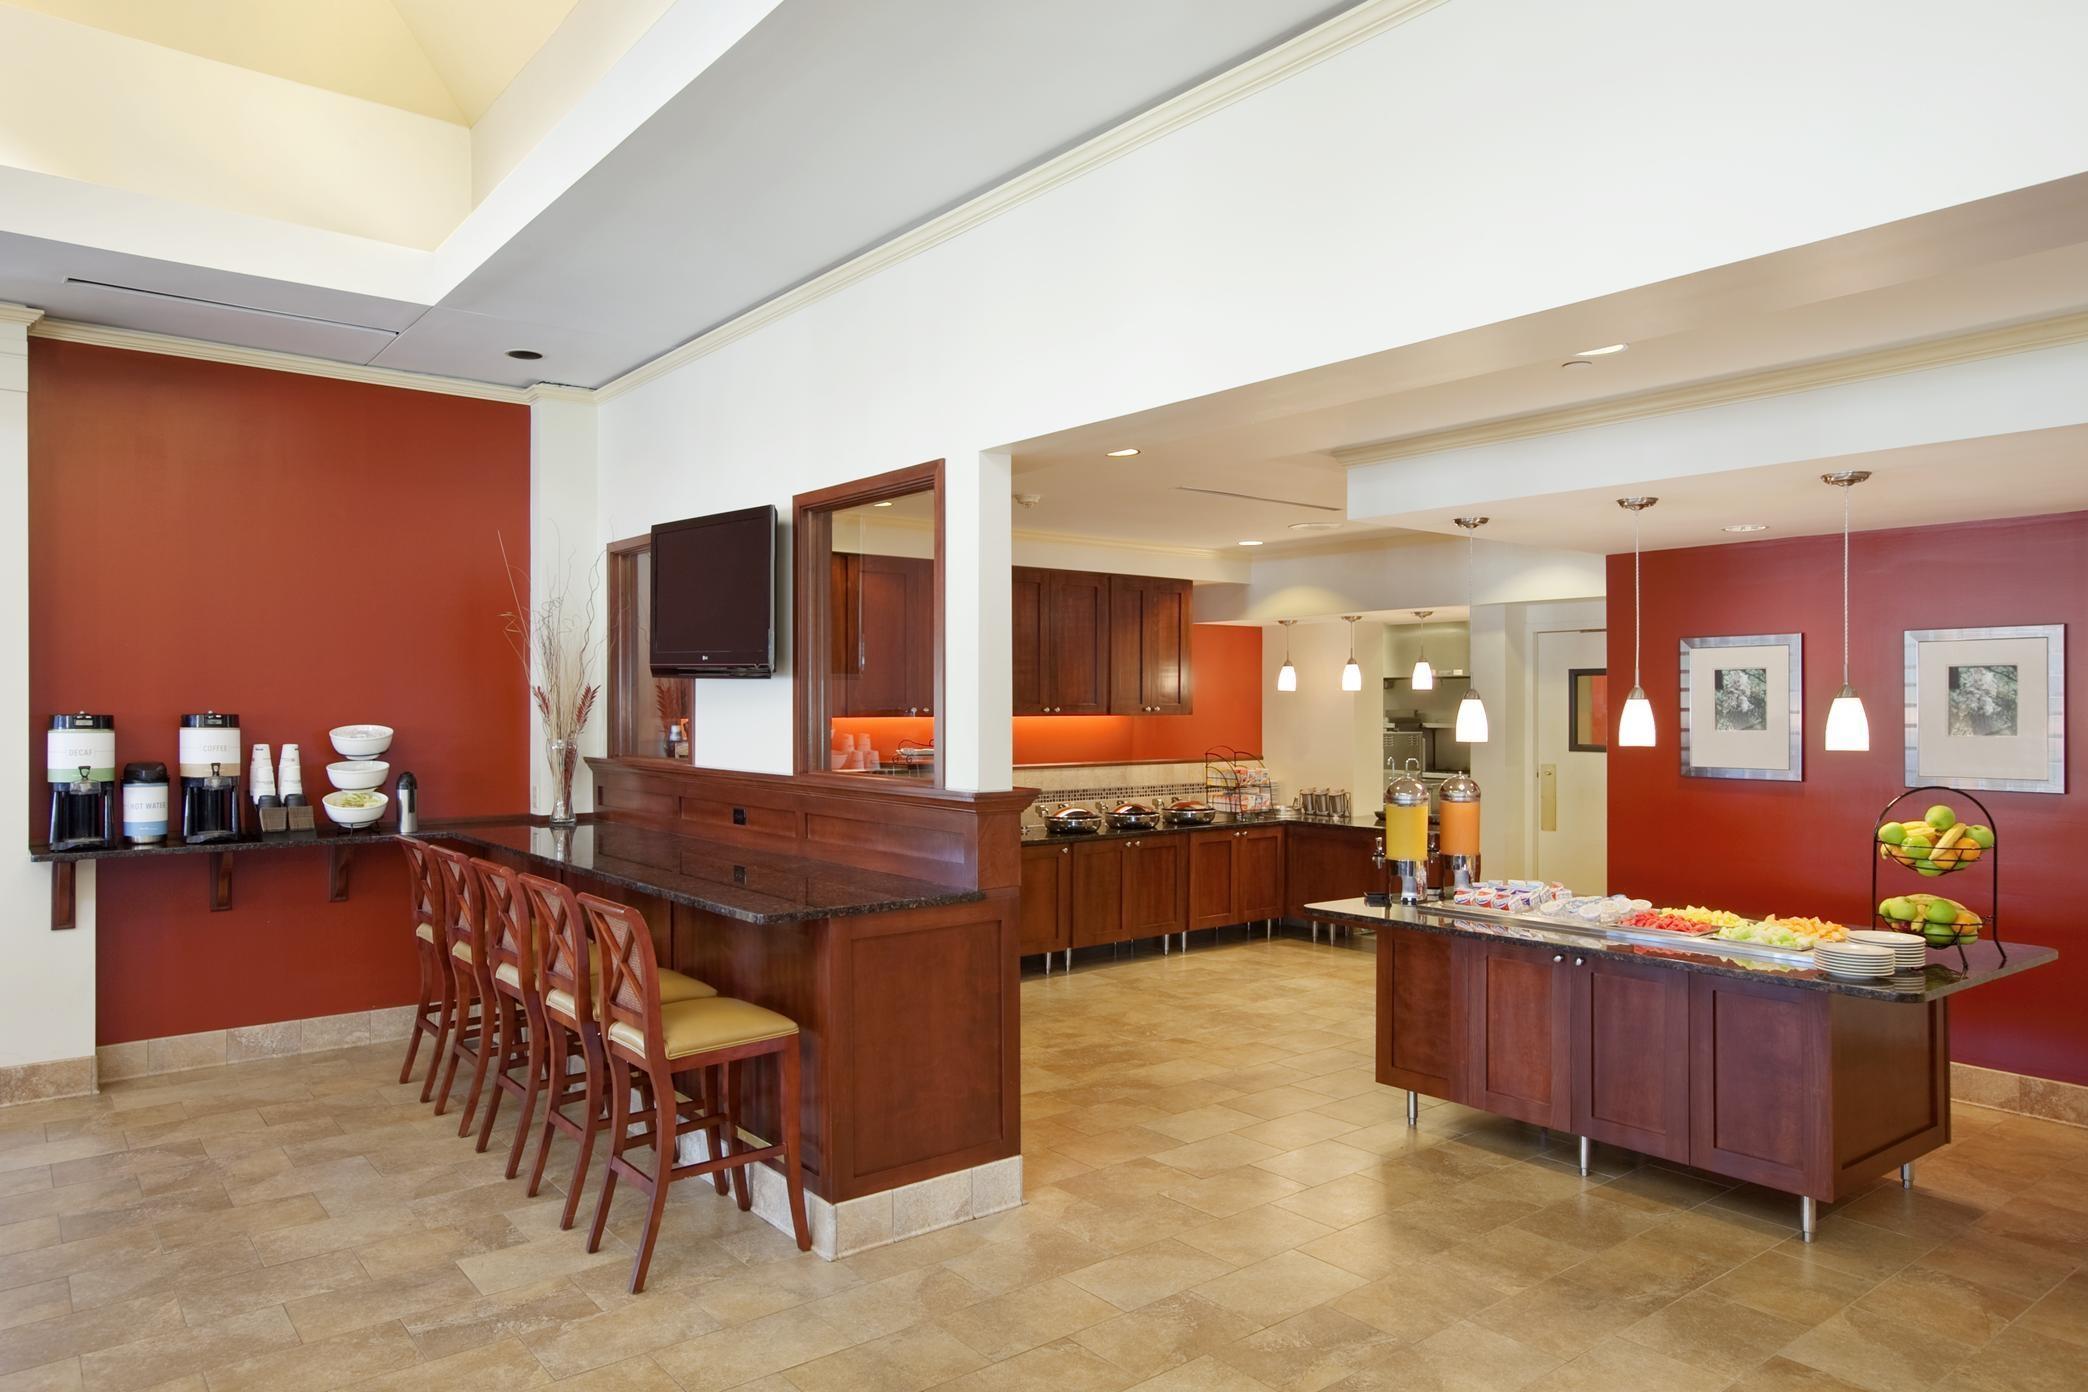 Hilton Garden Inn Chicago/Oakbrook Terrace image 8